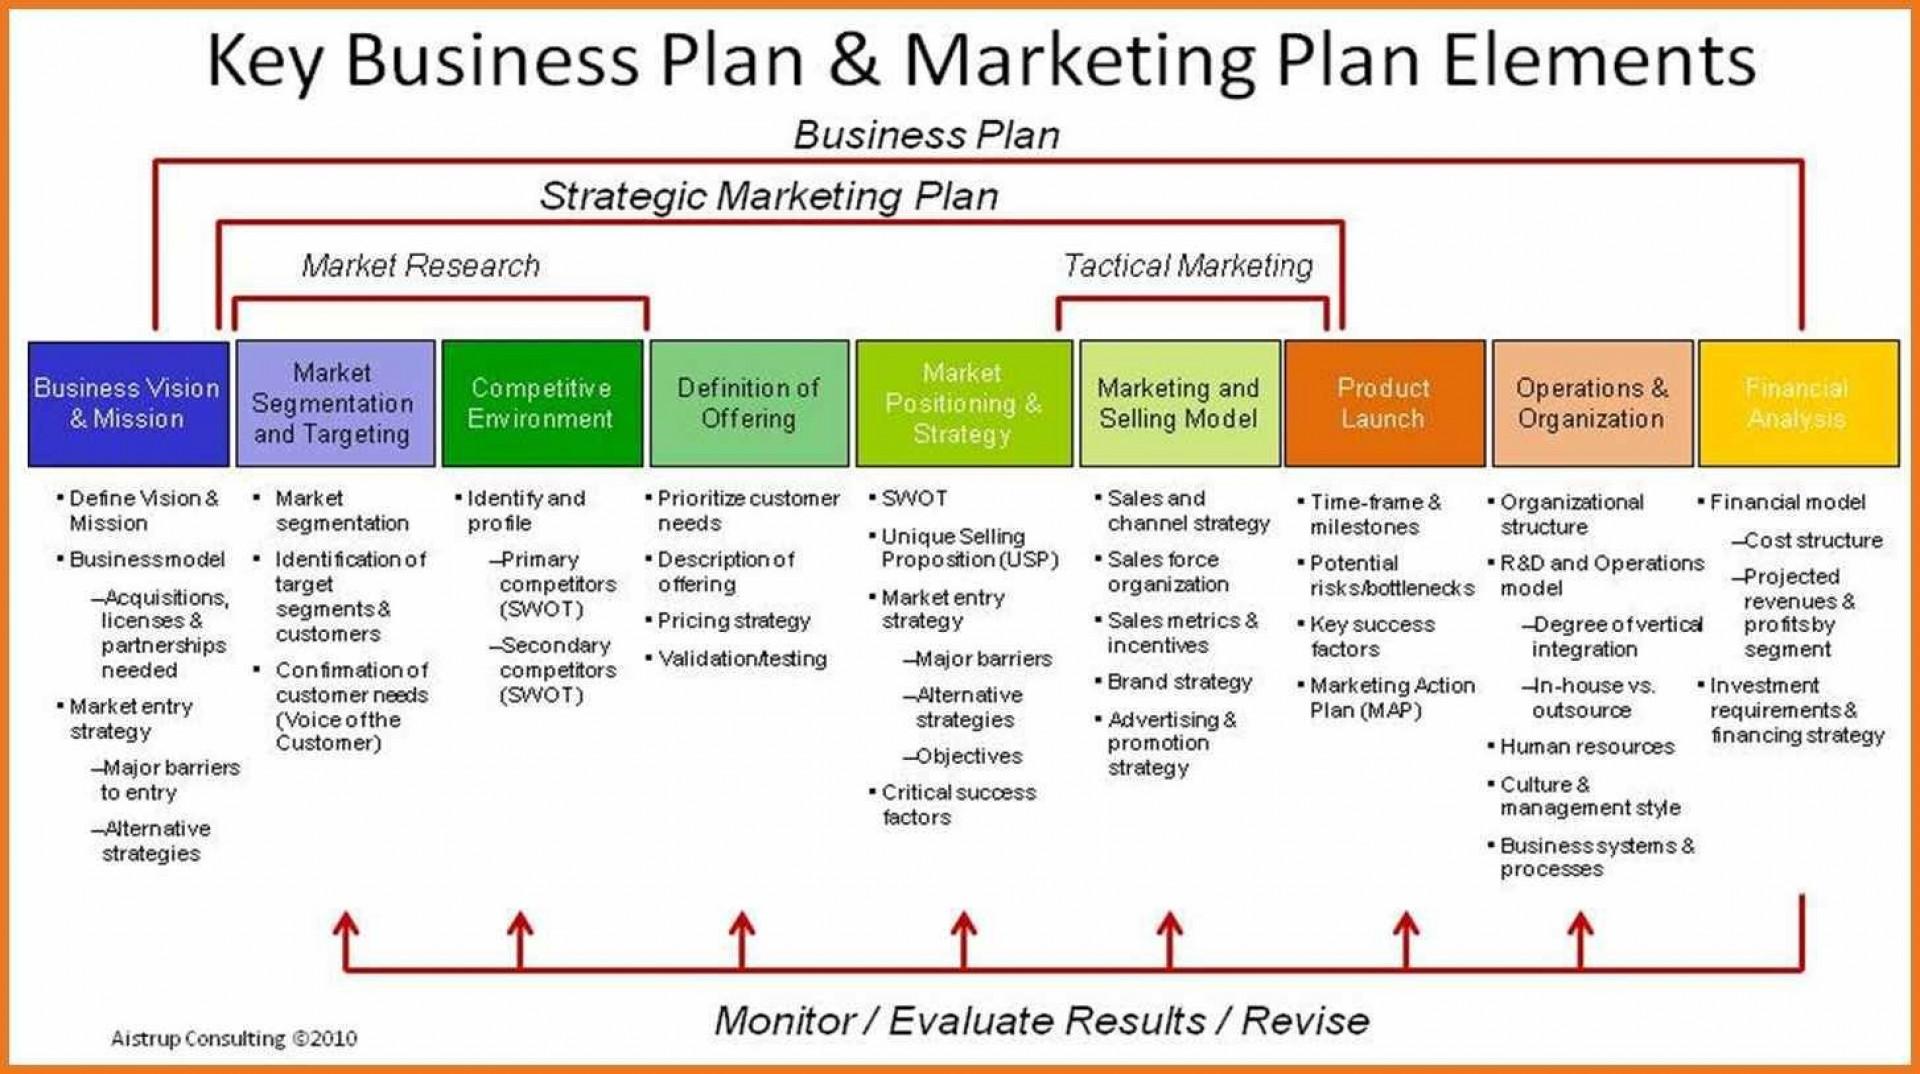 004 Surprising Marketing Plan Template Word Free Download Idea 1920